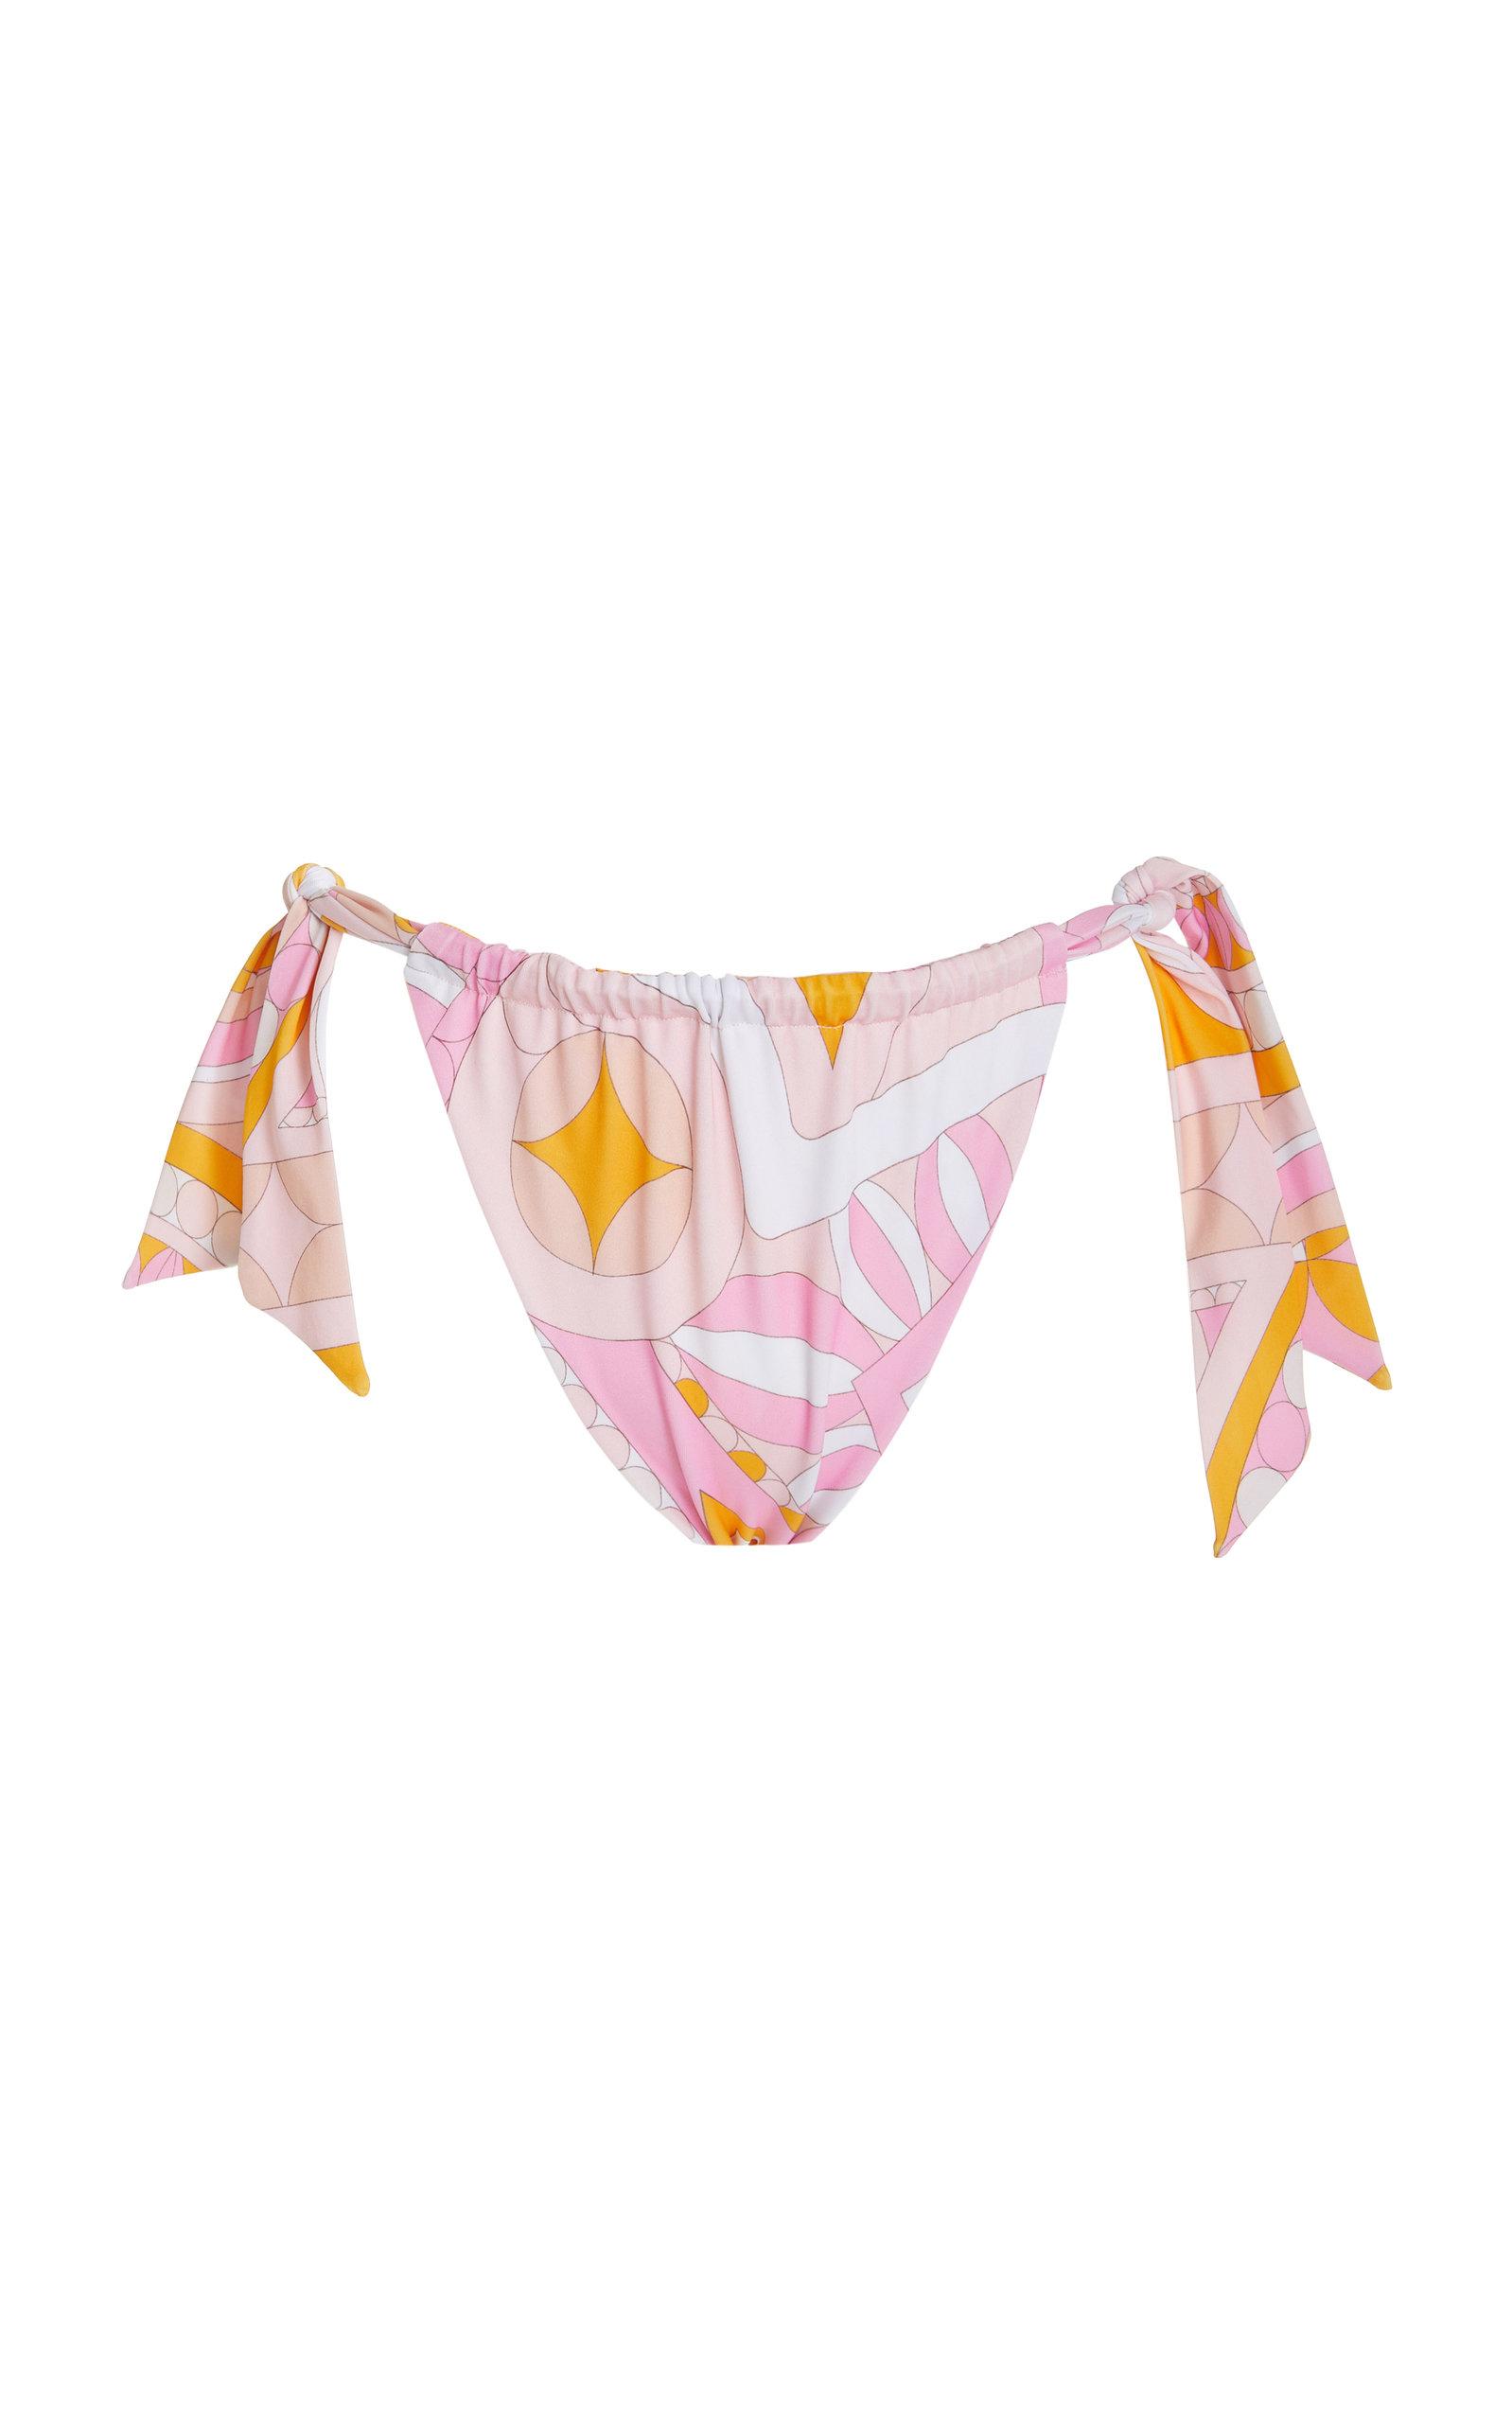 Women's Mantra Tie-Detailed Printed Bikini Bottom